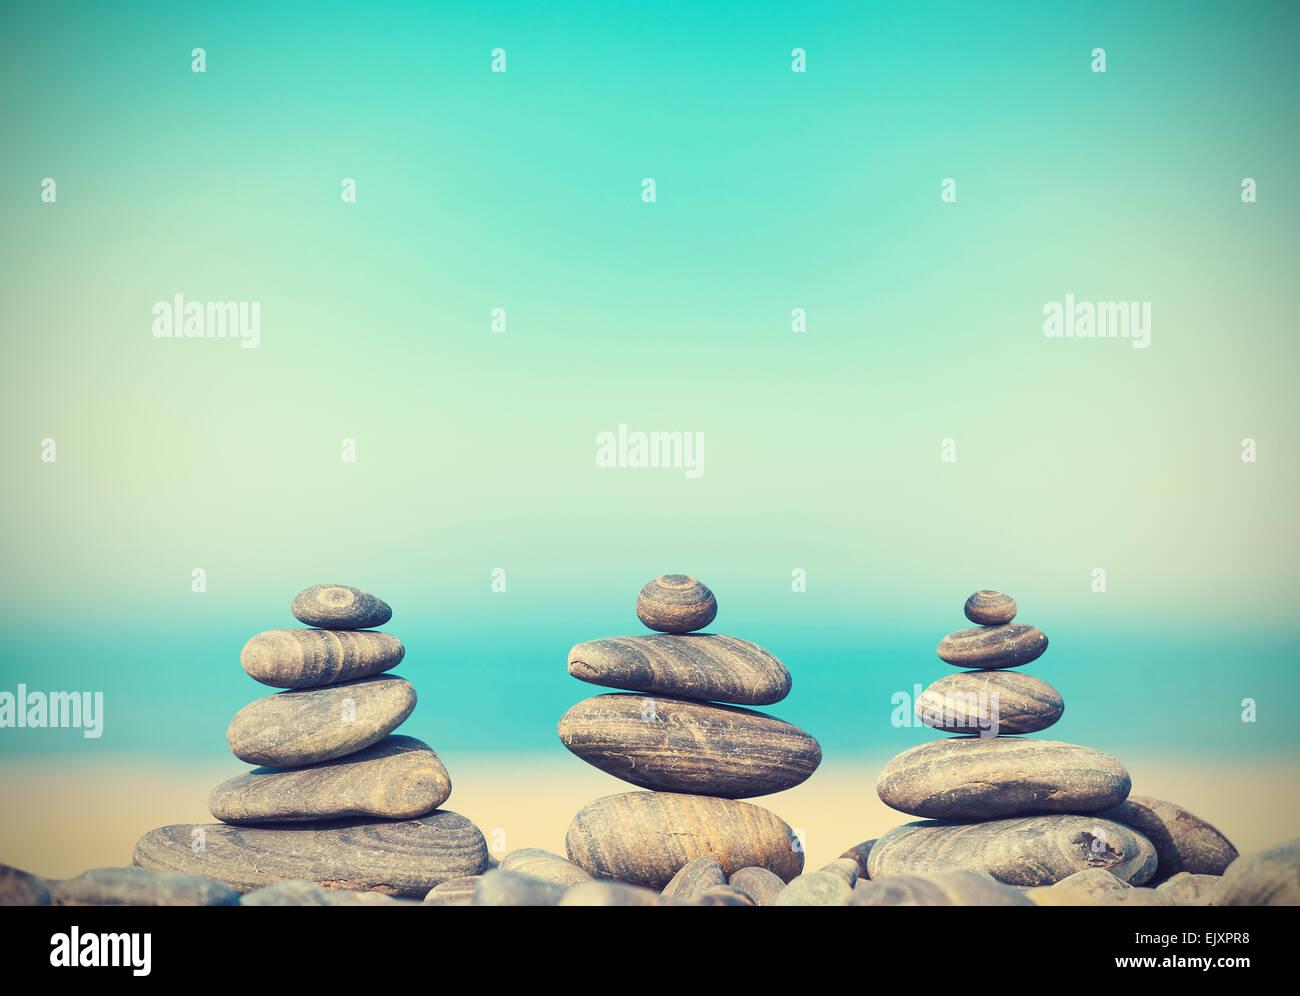 Vintage retro style image of stone pyramids on beach, Zen spa concept background. - Stock Image